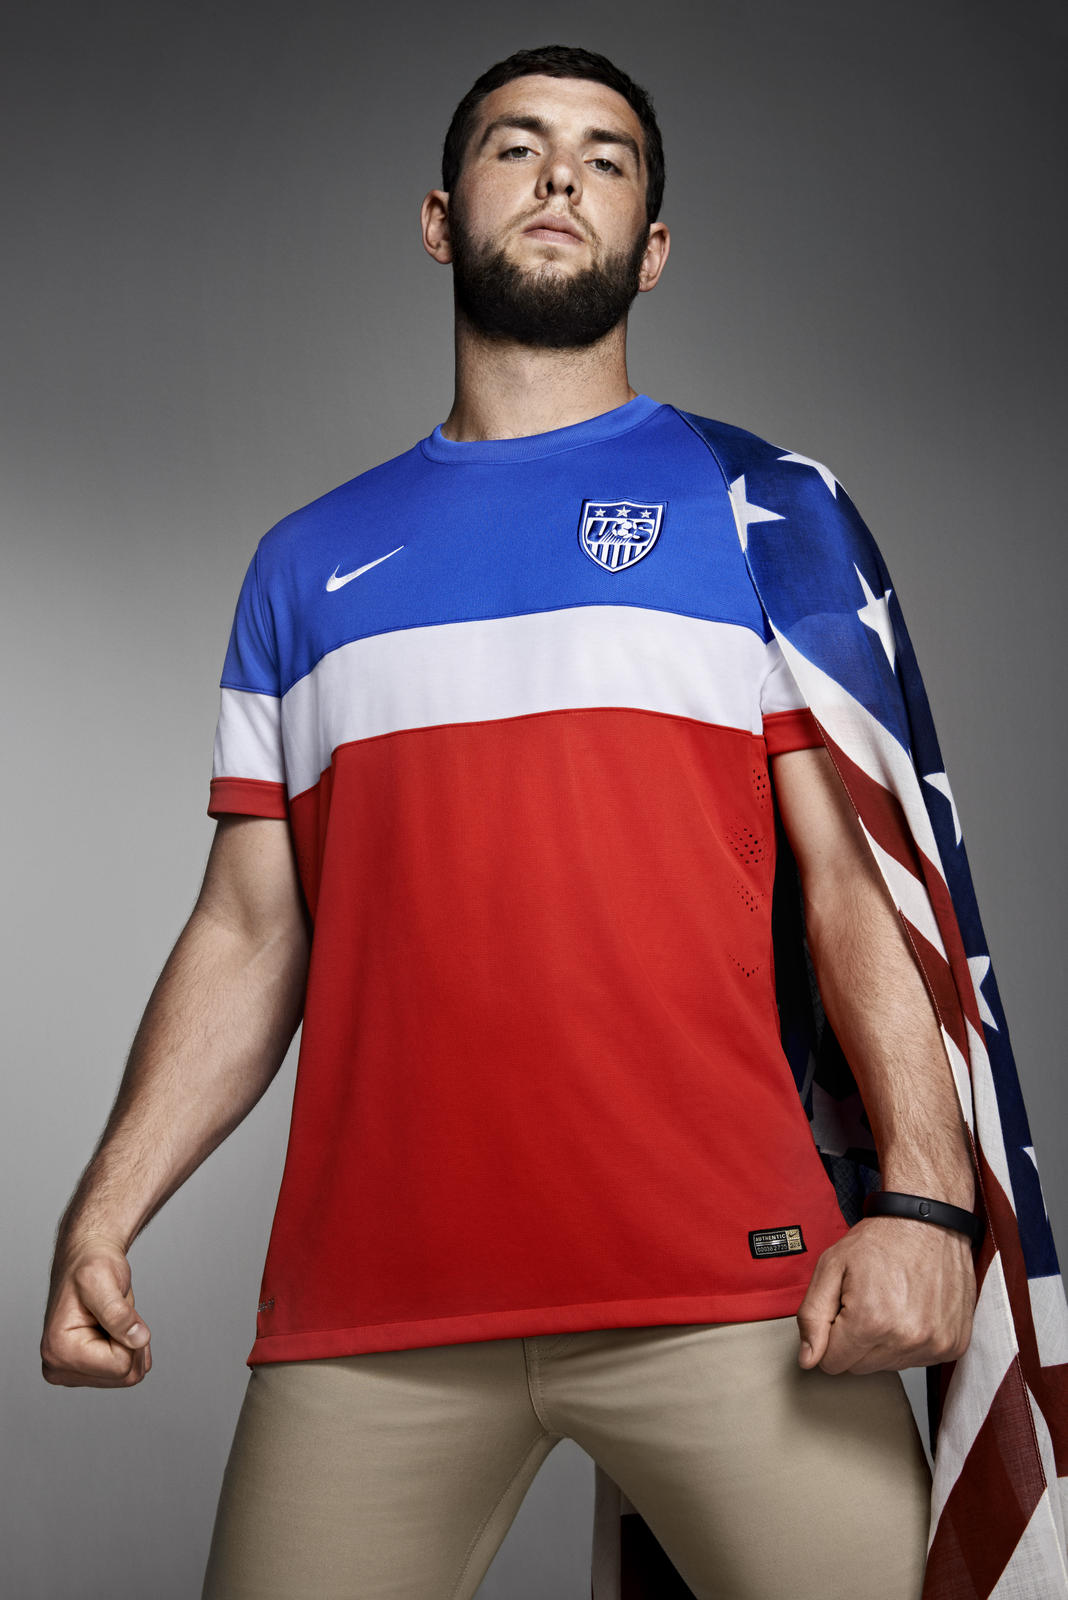 Americana At Brand >> Nike Soccer Unveils 2014 U.S. National Team Away Kit - Nike News